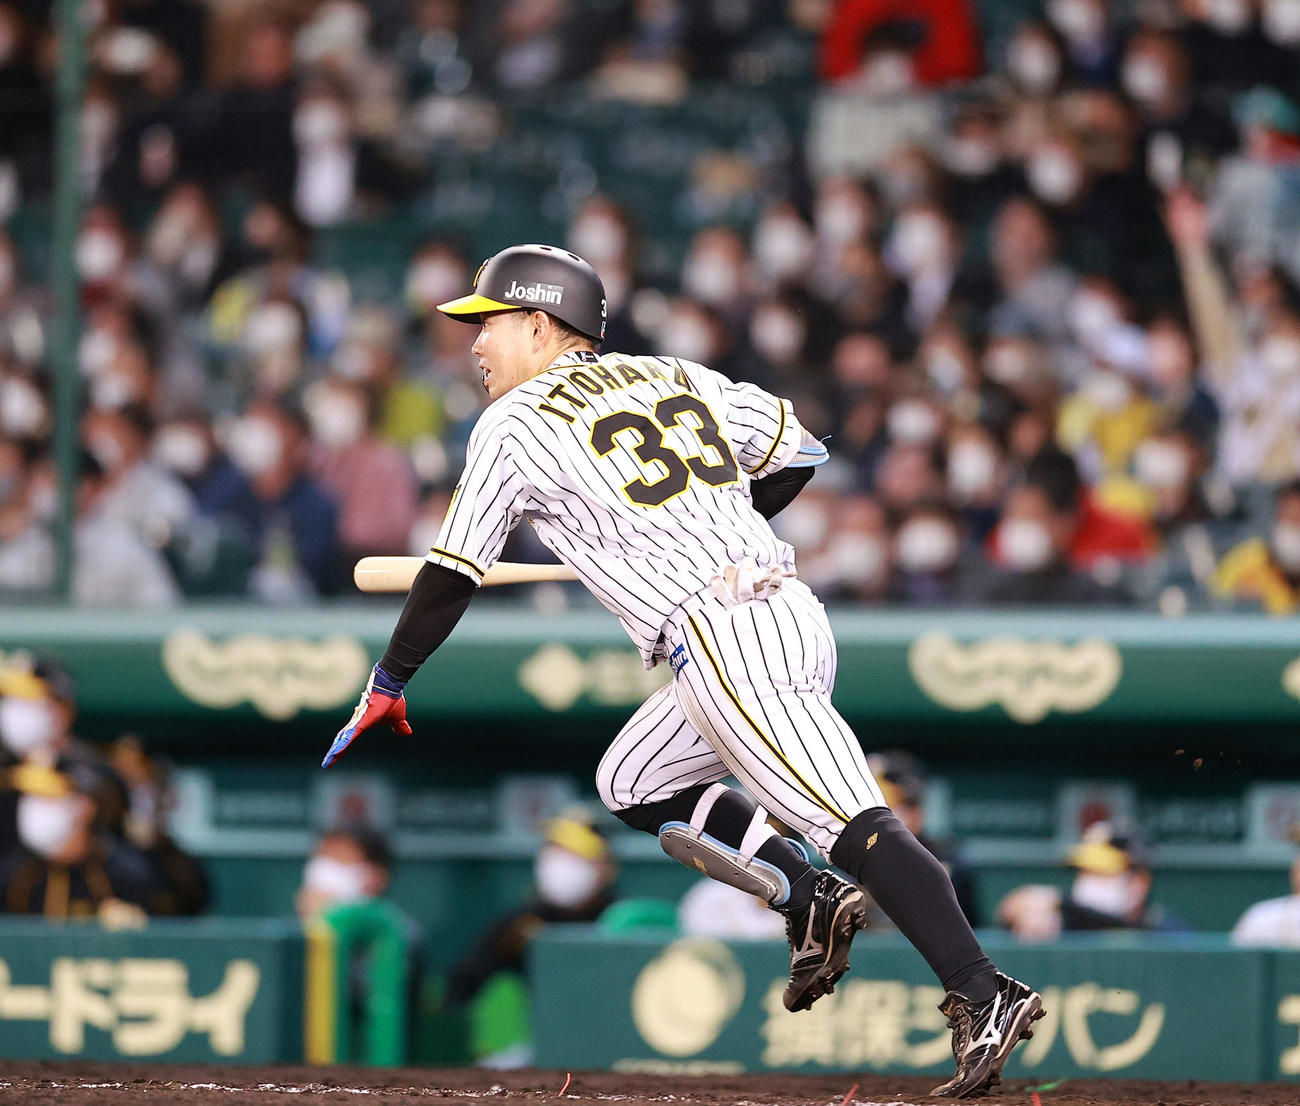 阪神対巨人 4回裏阪神2死一、三塁、糸原は中越え2点適時二塁打を放つ(撮影・浅見桂子)